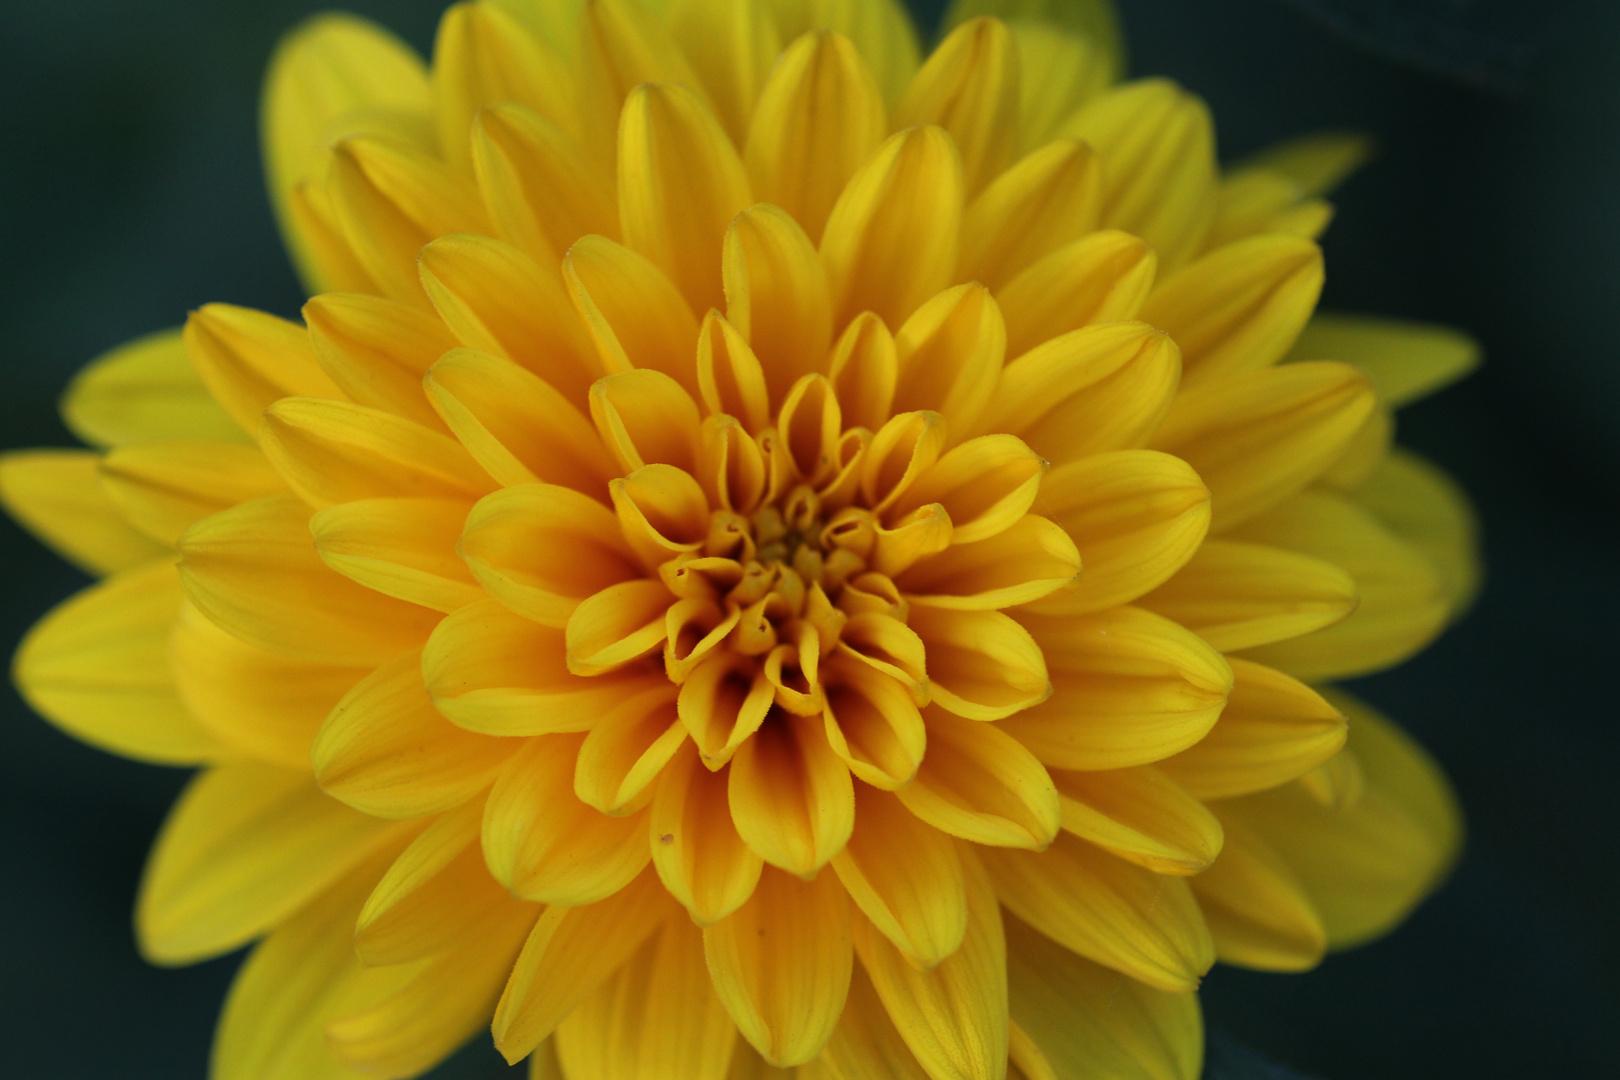 Gartenblume - Ganz nah